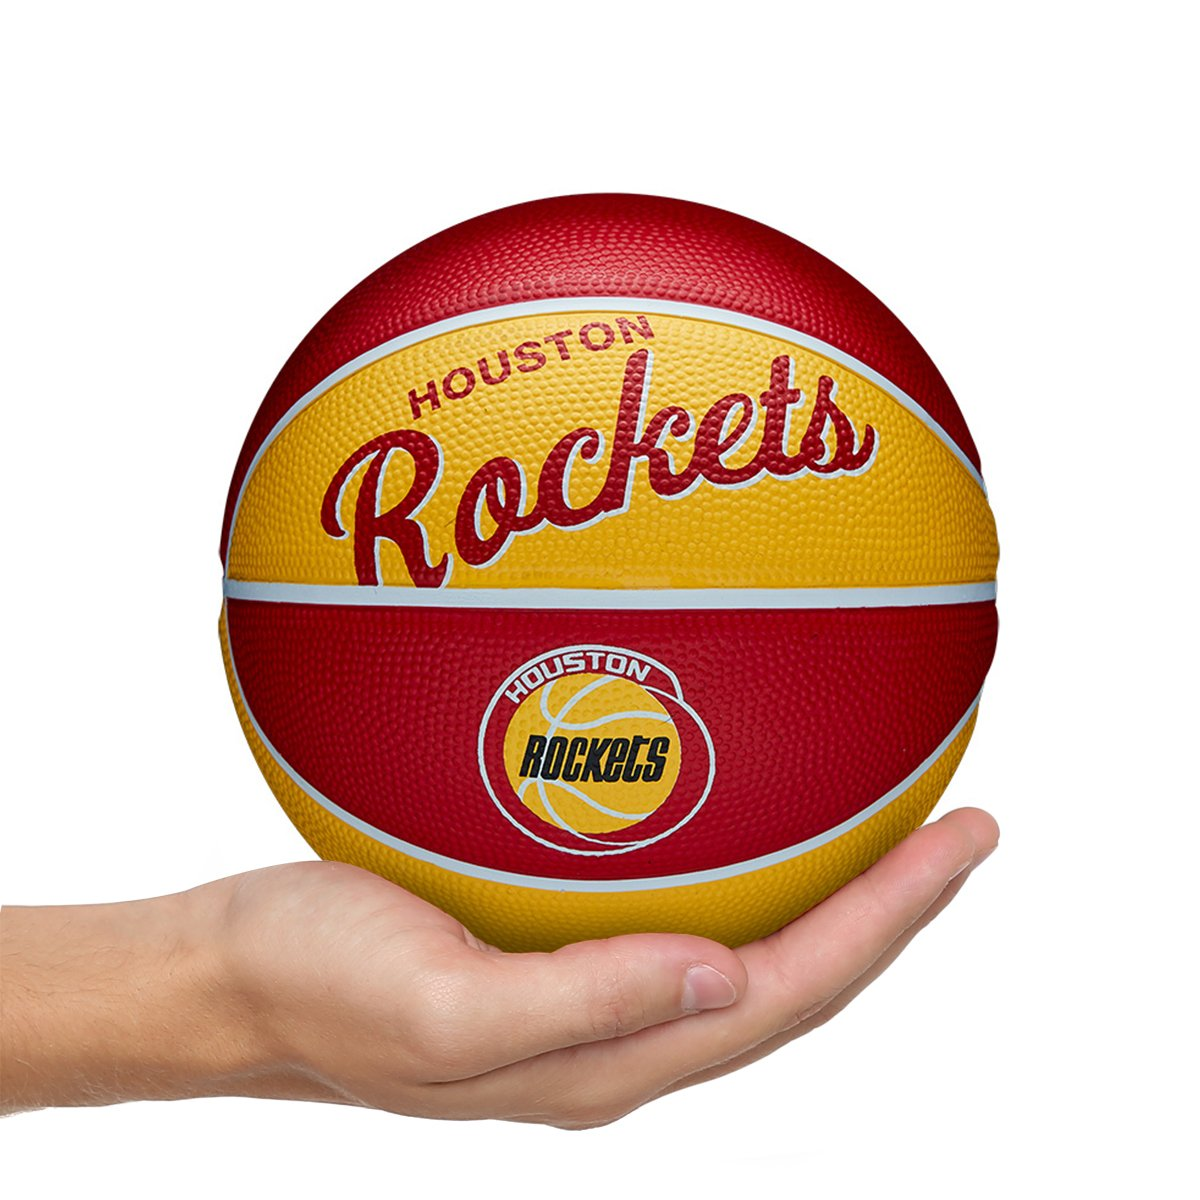 Mini Bola de Basquete NBA Retrô Houston Rockets Wilson